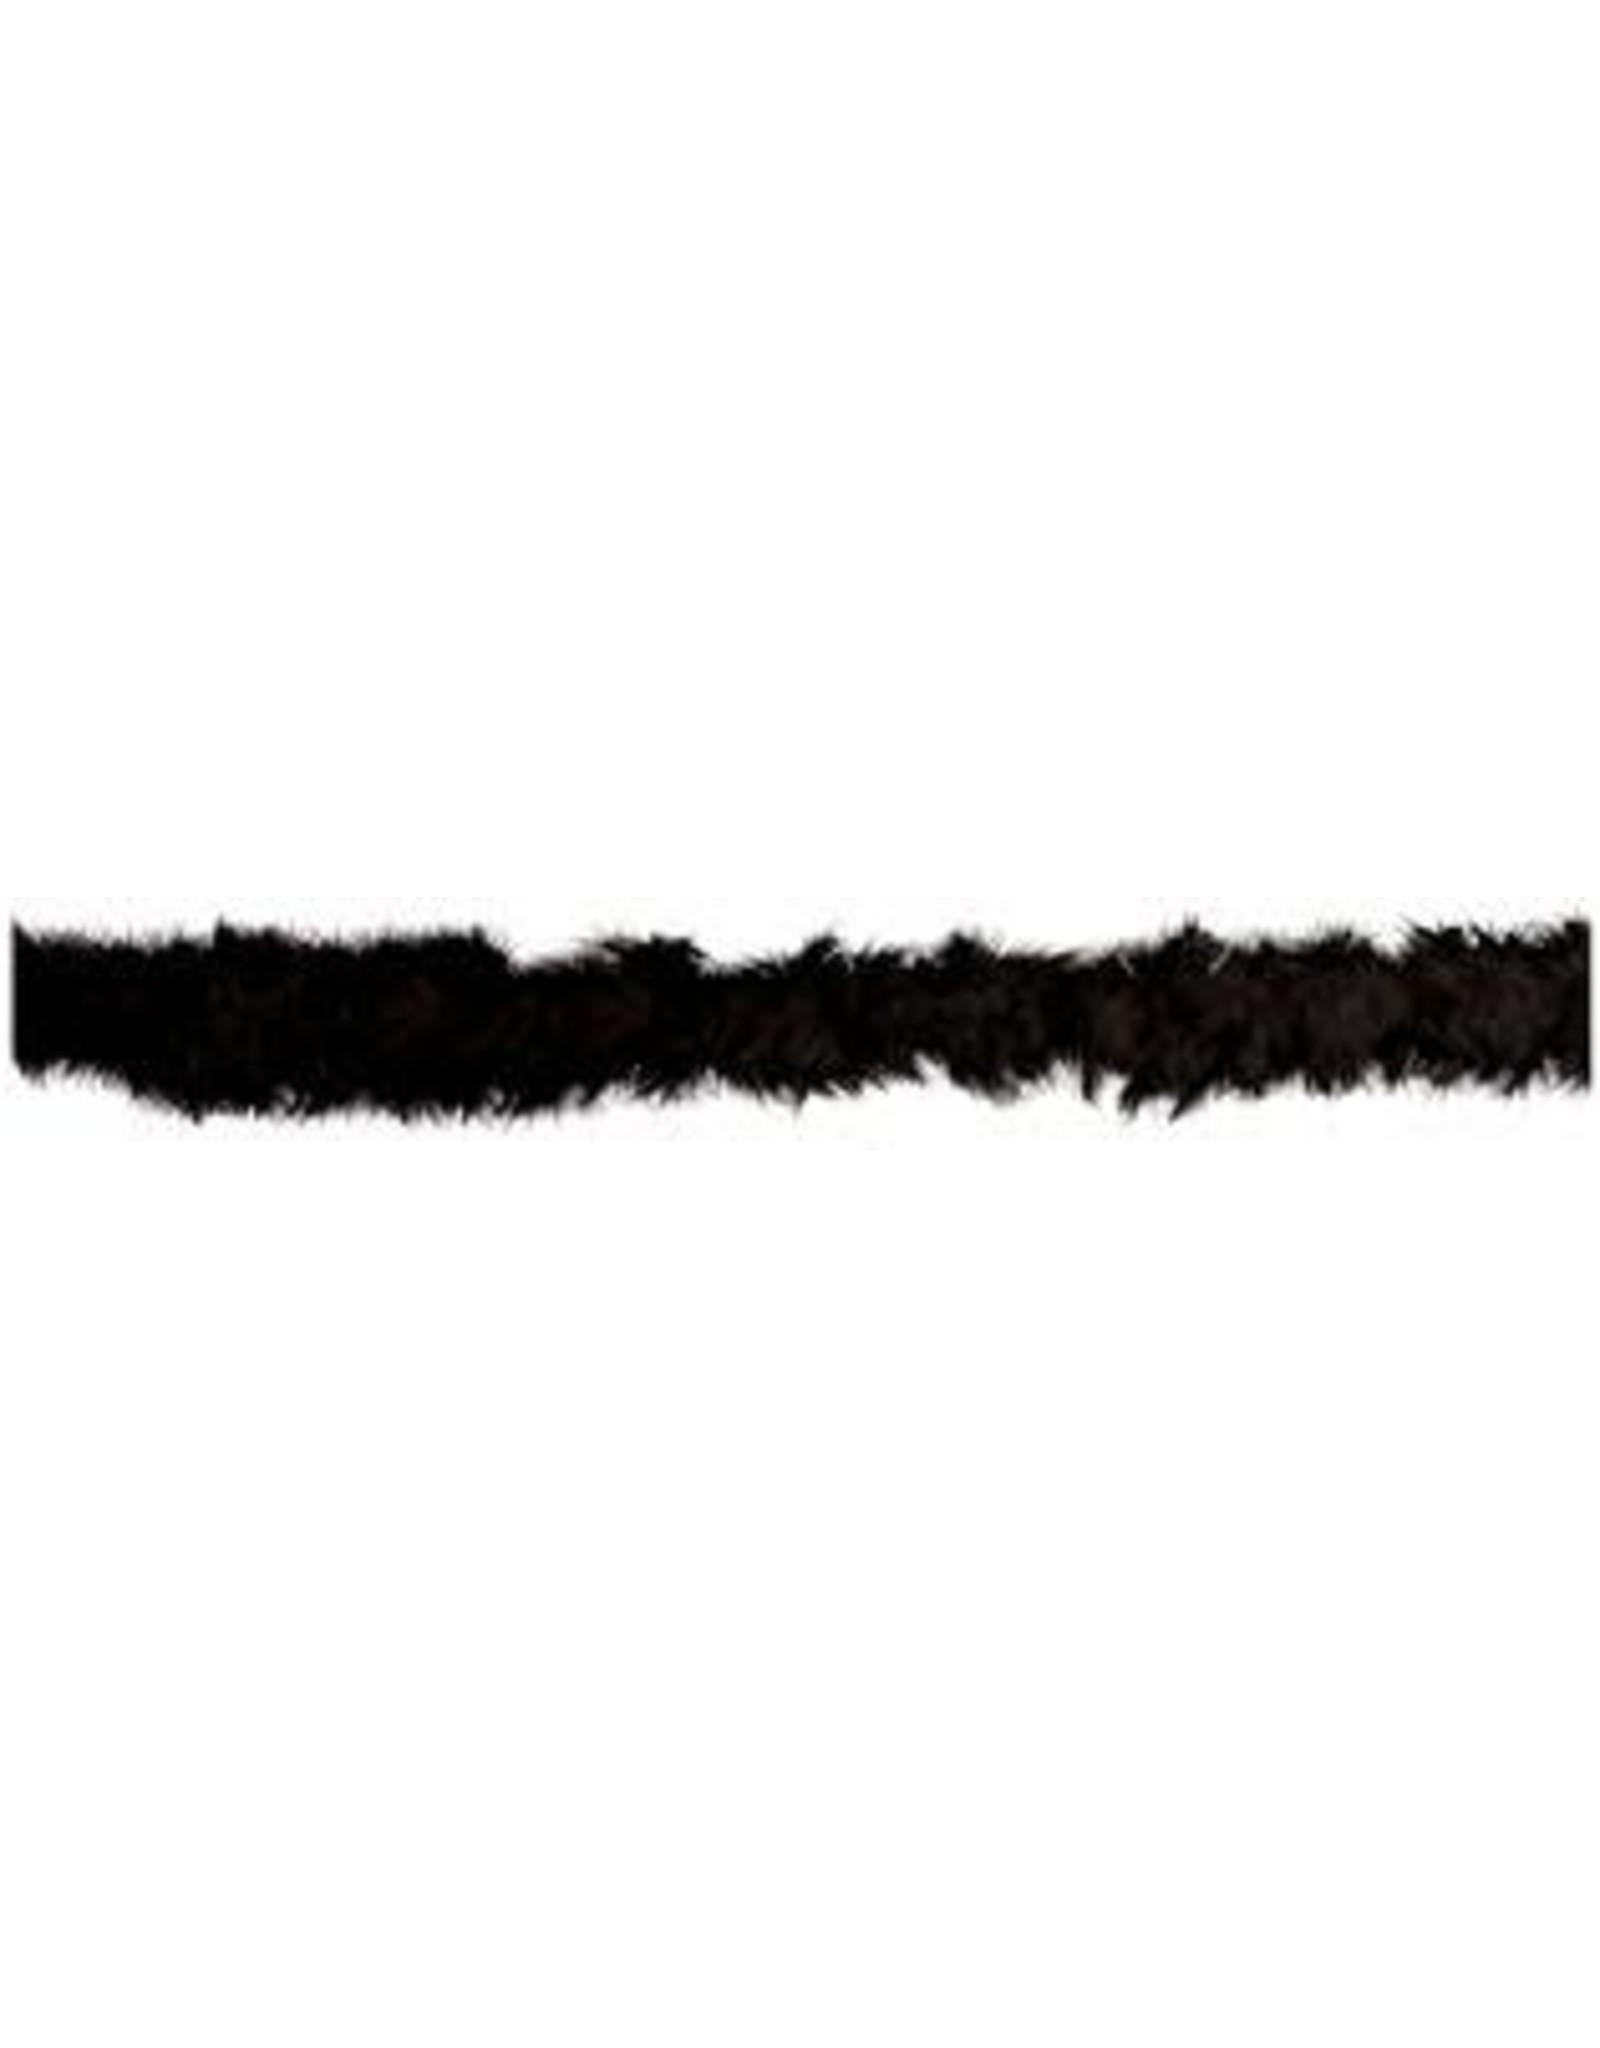 Beistle 6' Black Boa